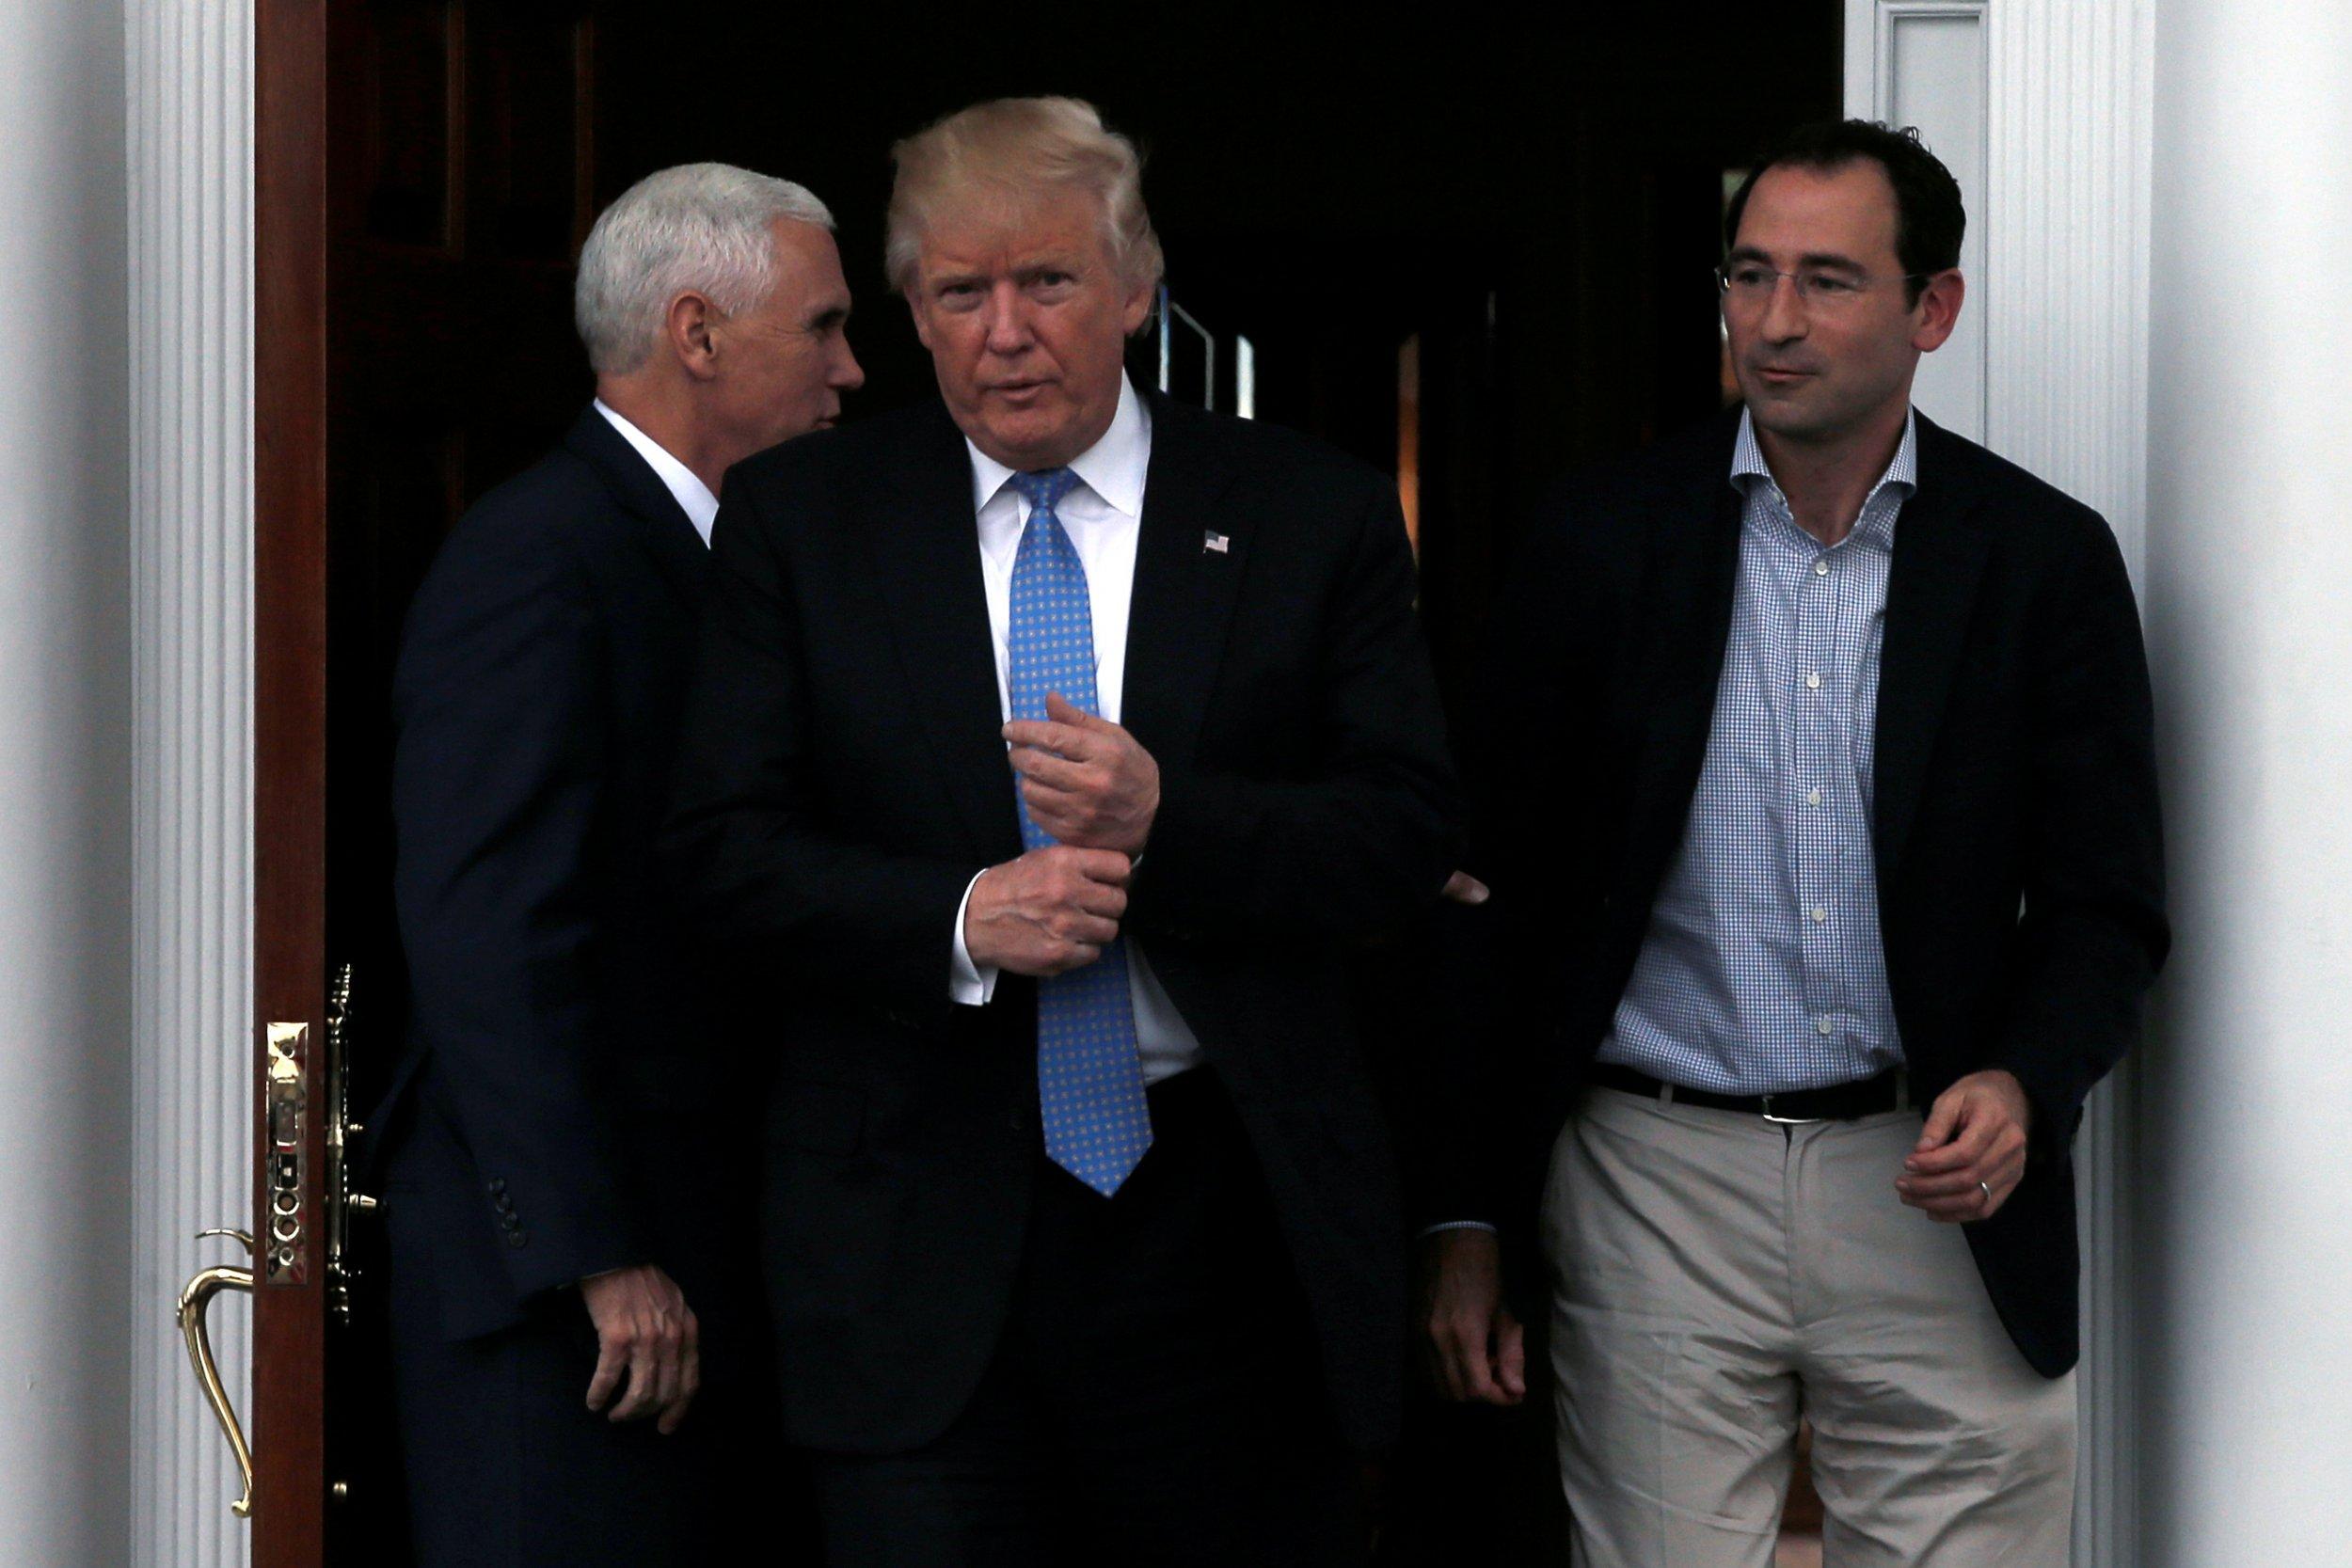 Jonathan Gray and Donald Trump